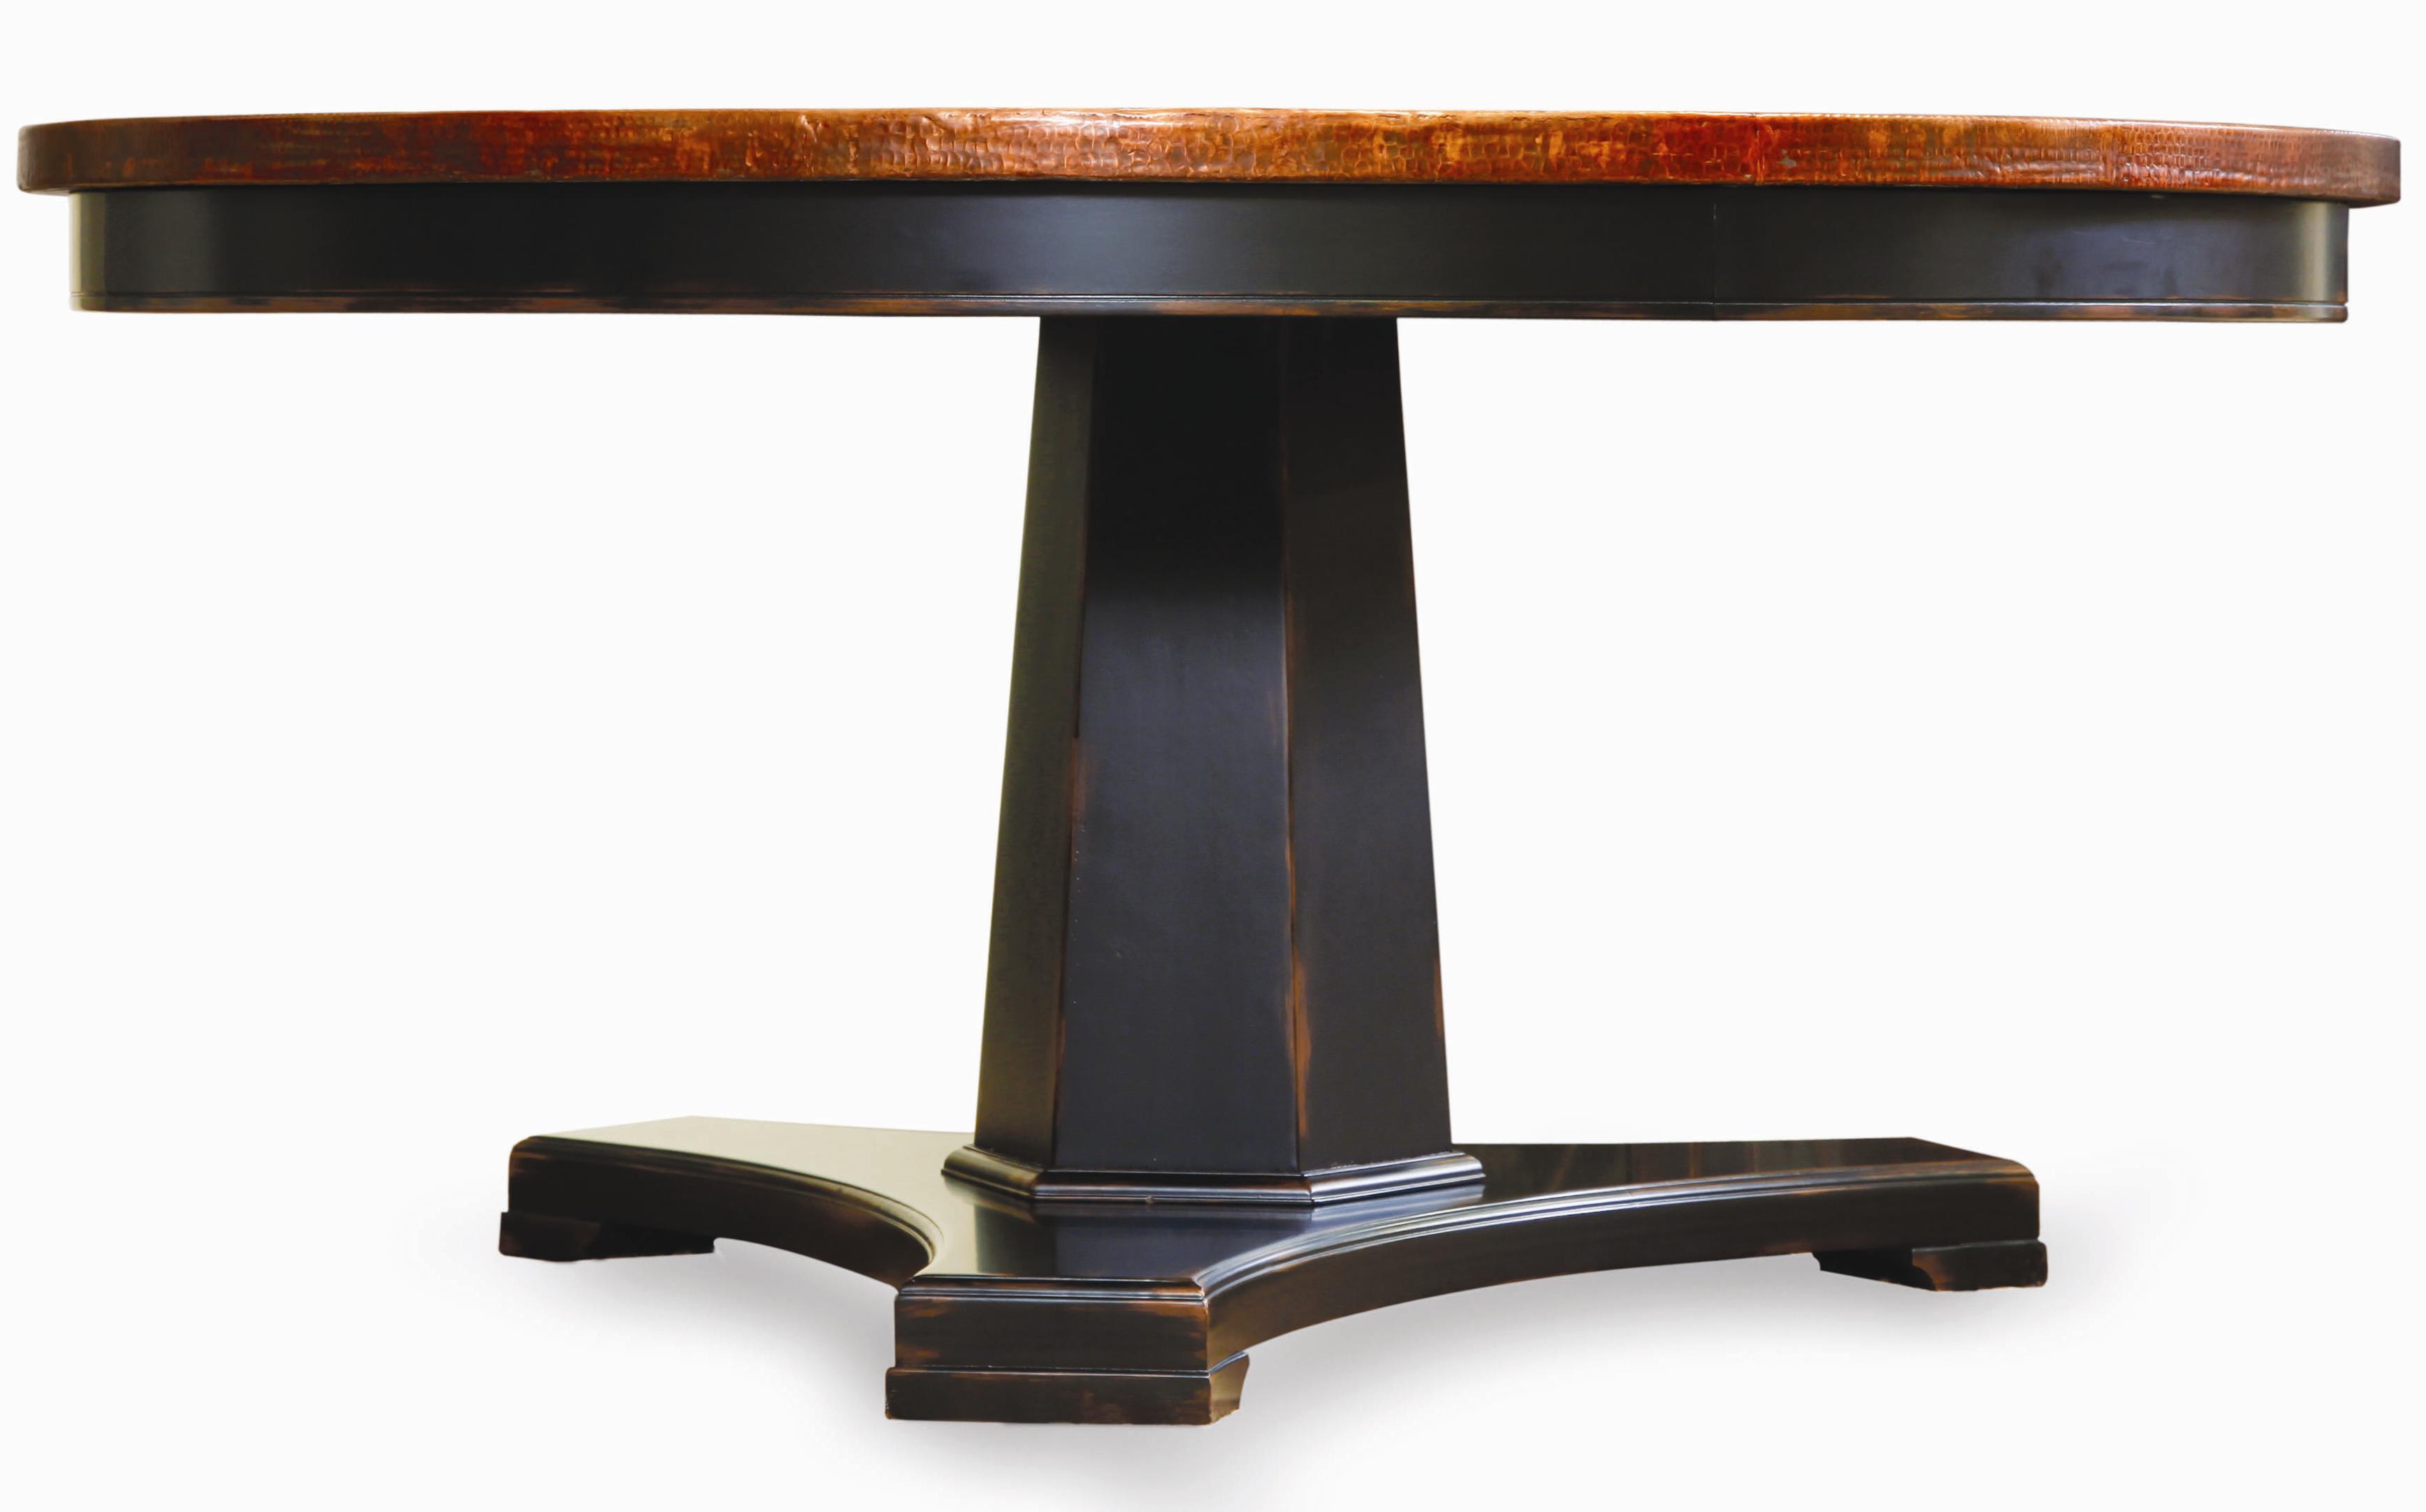 round pedestal kitchen table Hooker Furniture Sanctuary 60 Round Pedestal Dining Table Item Number